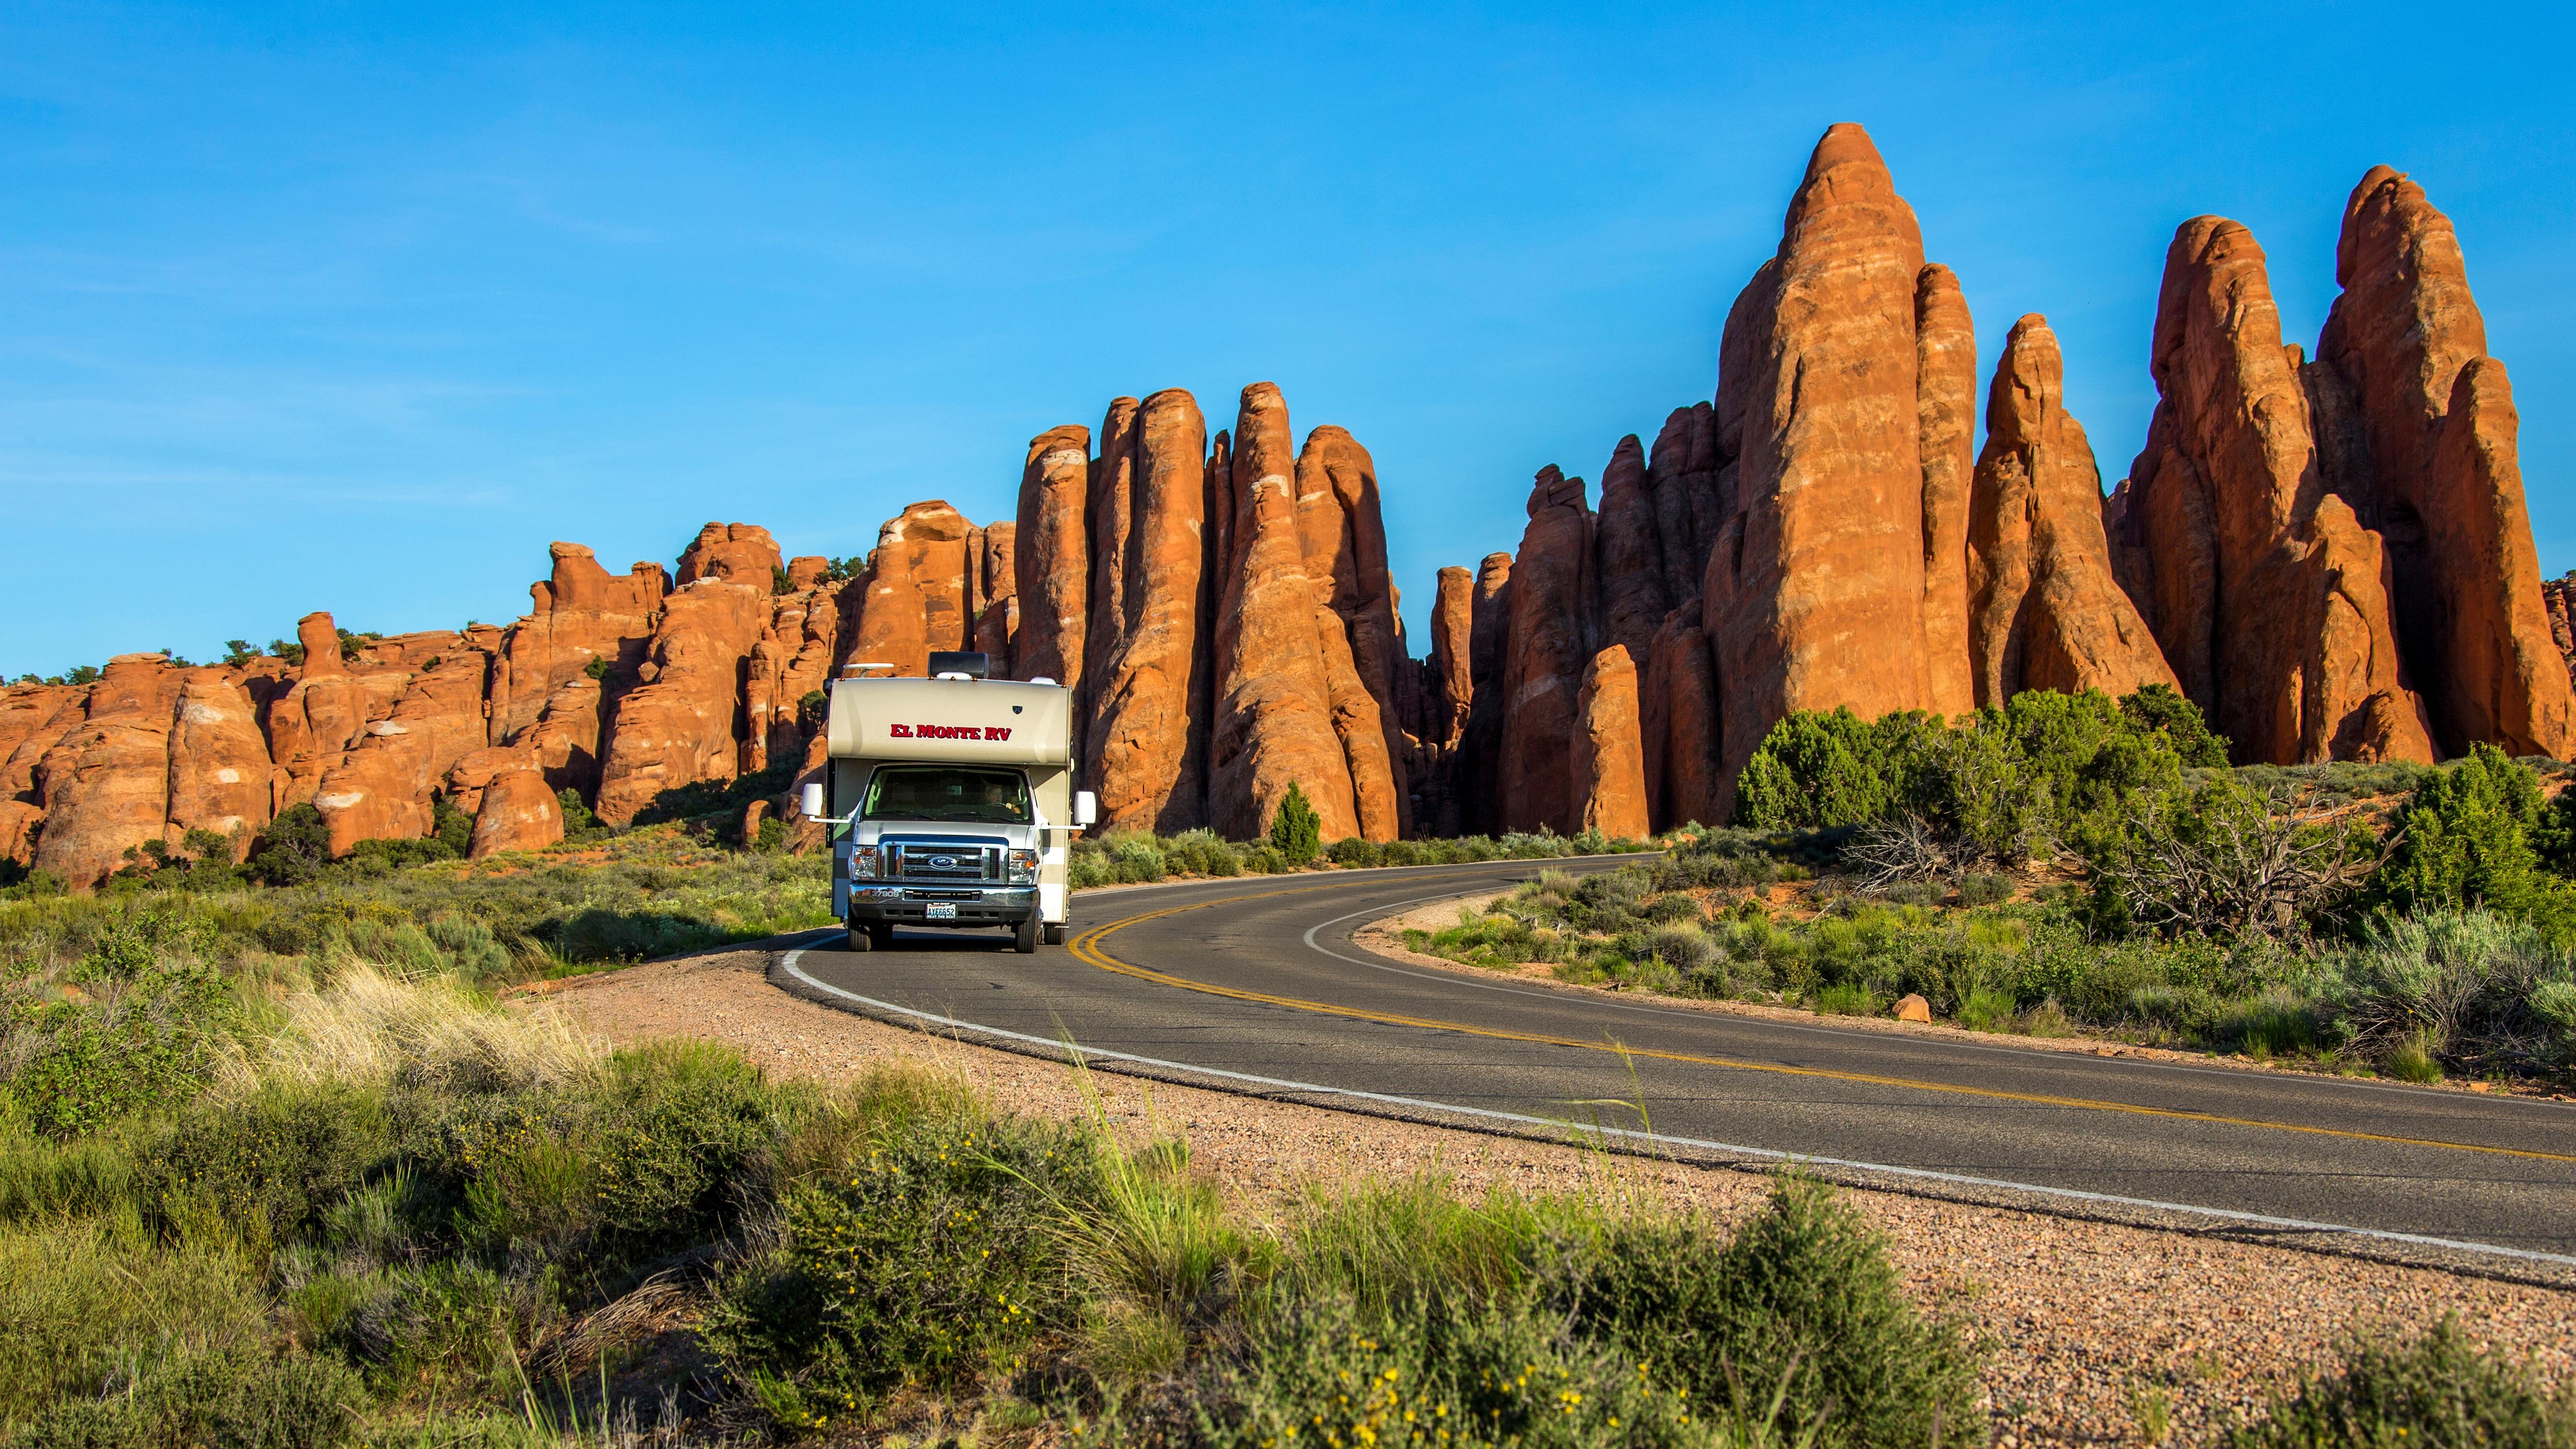 El Monte RV driving through Red Rocks, Utah.